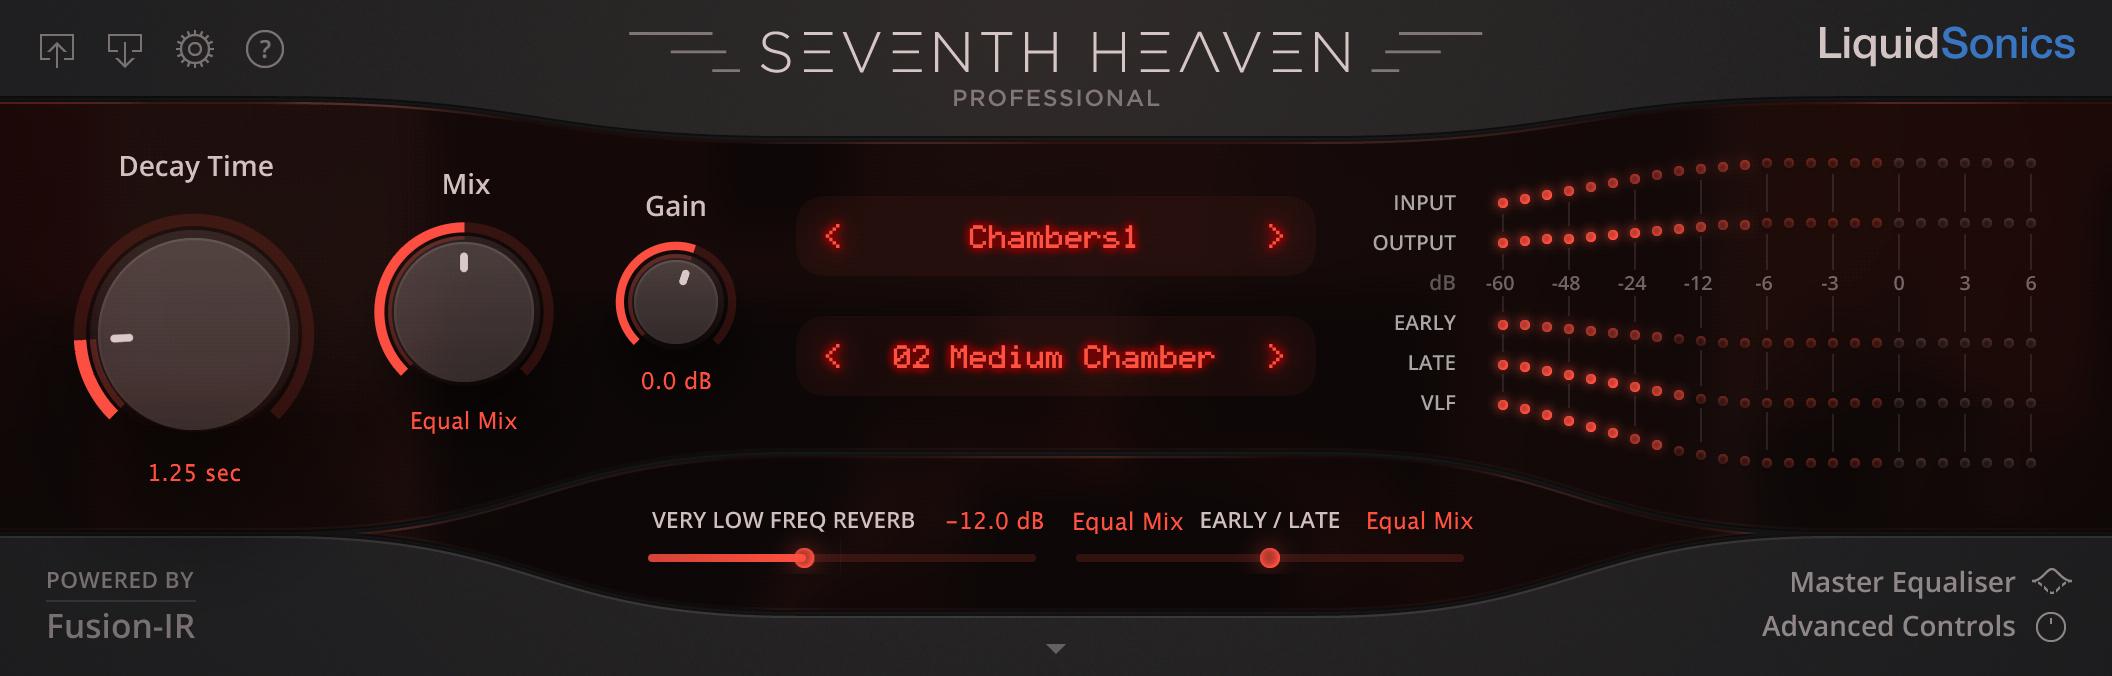 seventh_heaven_professional_01.png